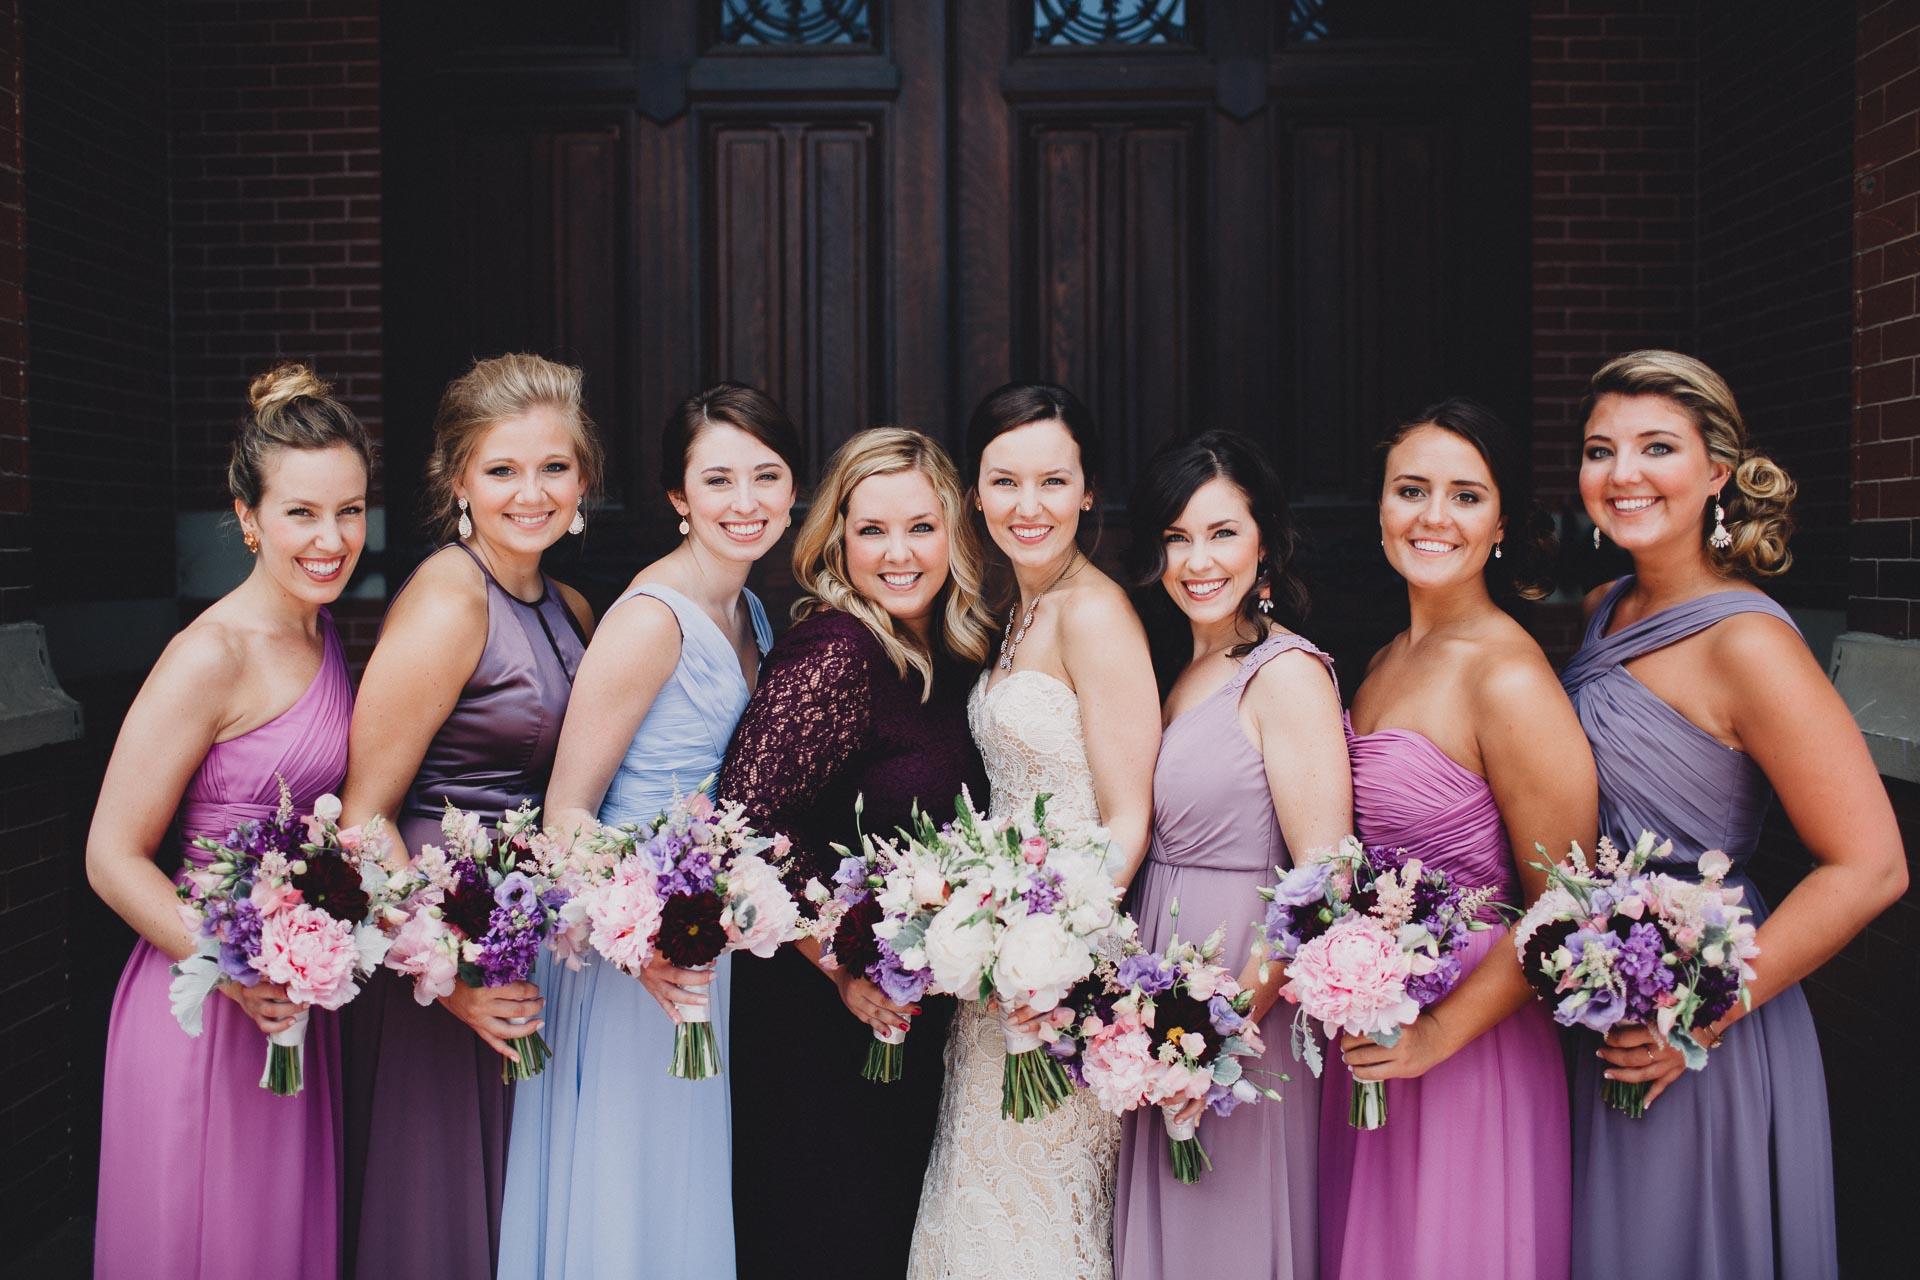 Julia-Michael-Cincinnati-Music-Hall-Wedding-051@2x.jpg